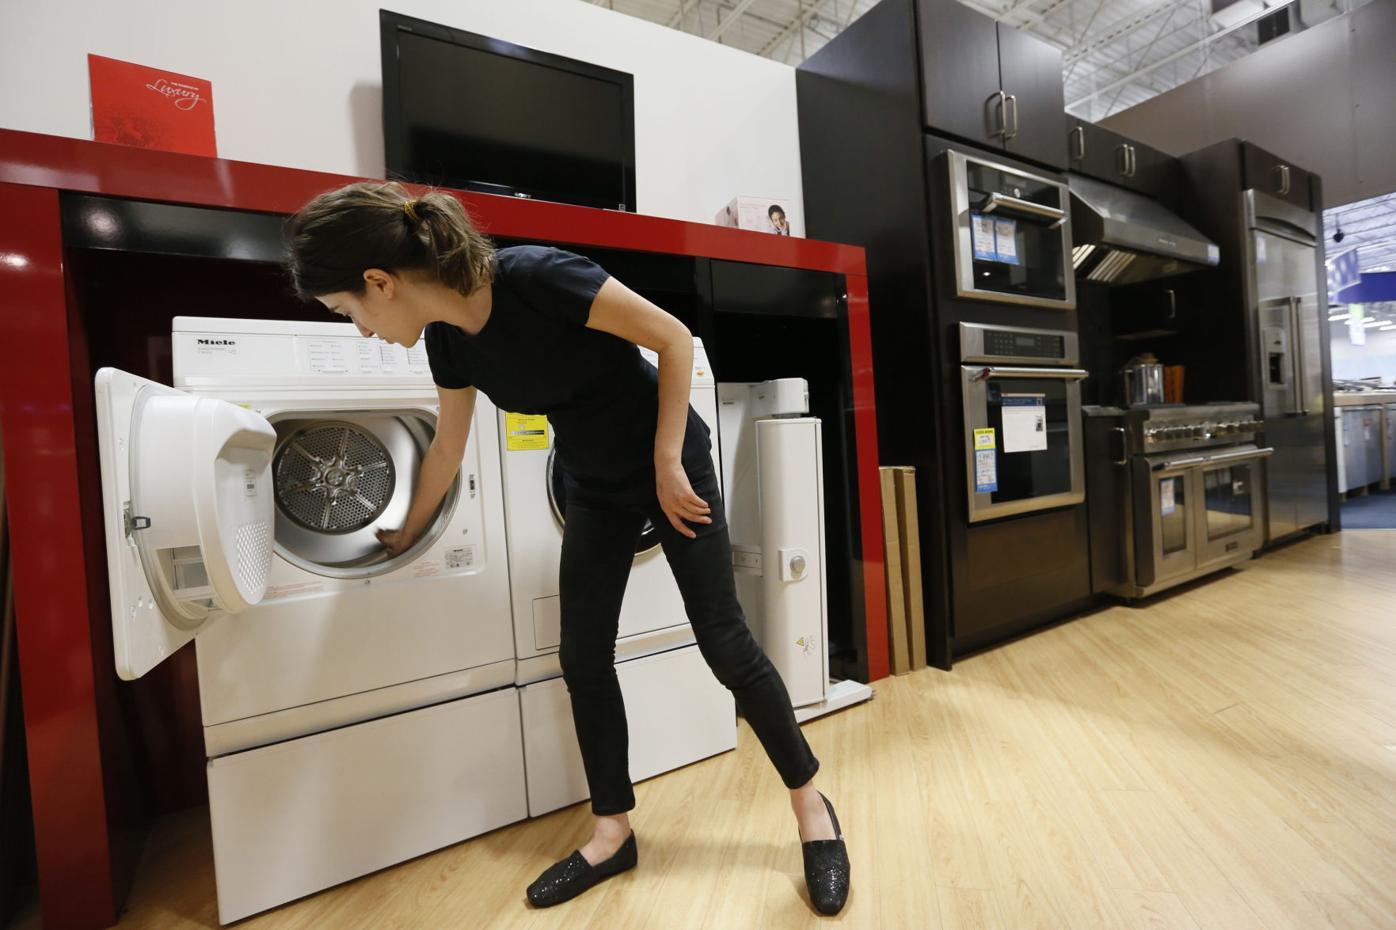 Energy efficient appliance